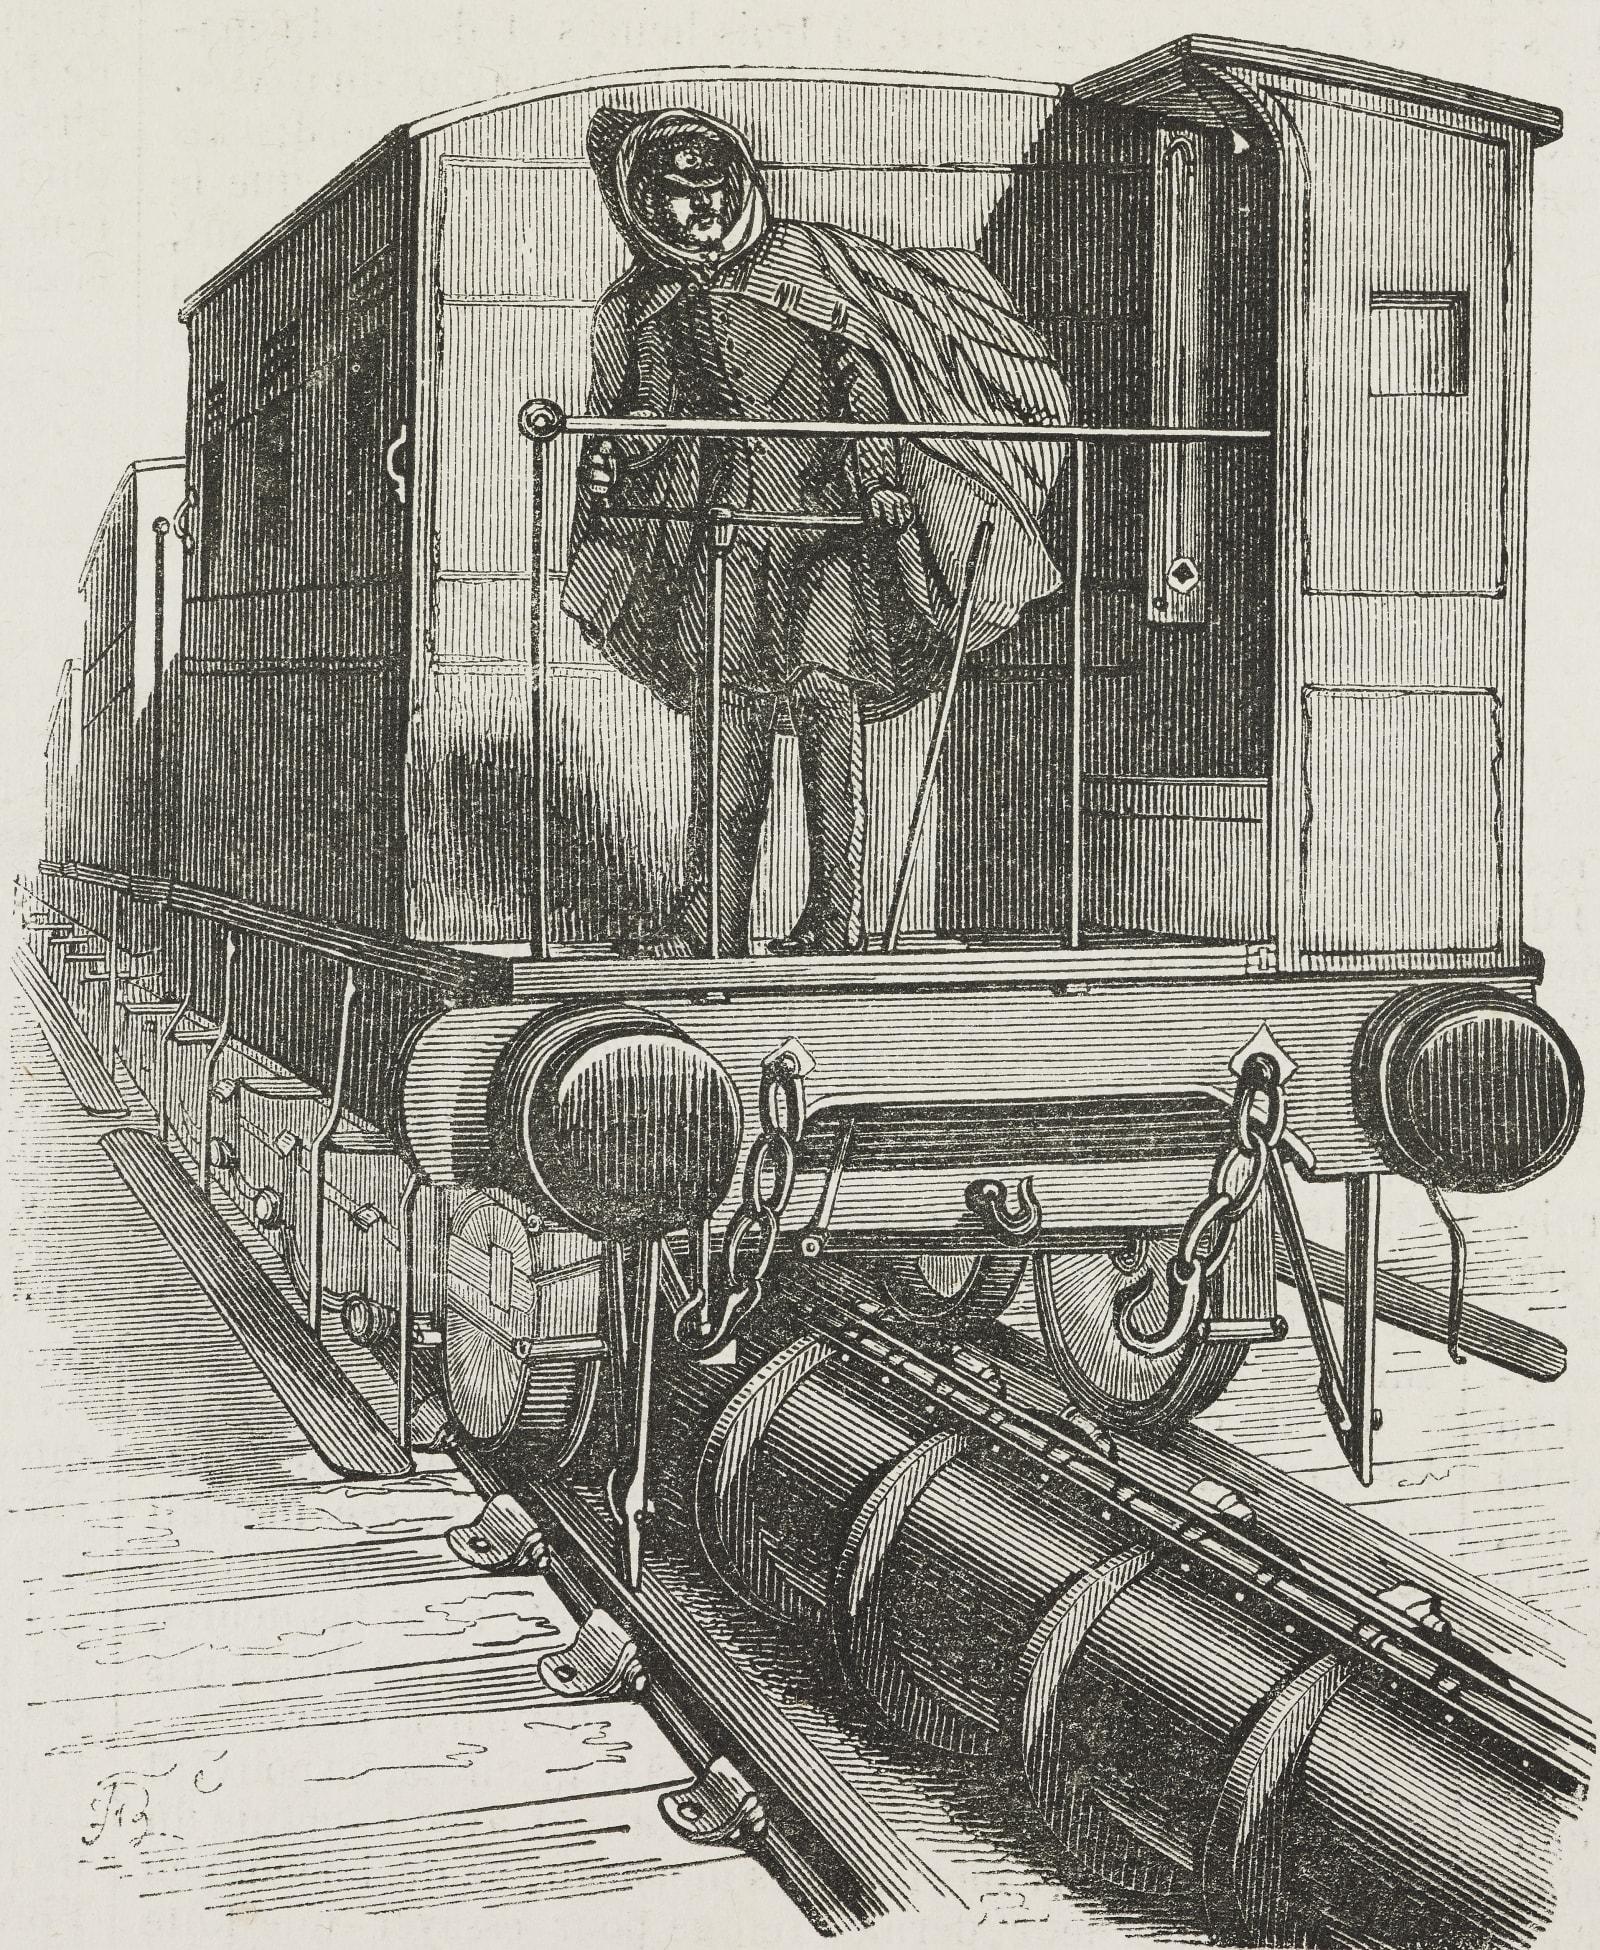 Convoy on the Saint-Germain atmospheric railway